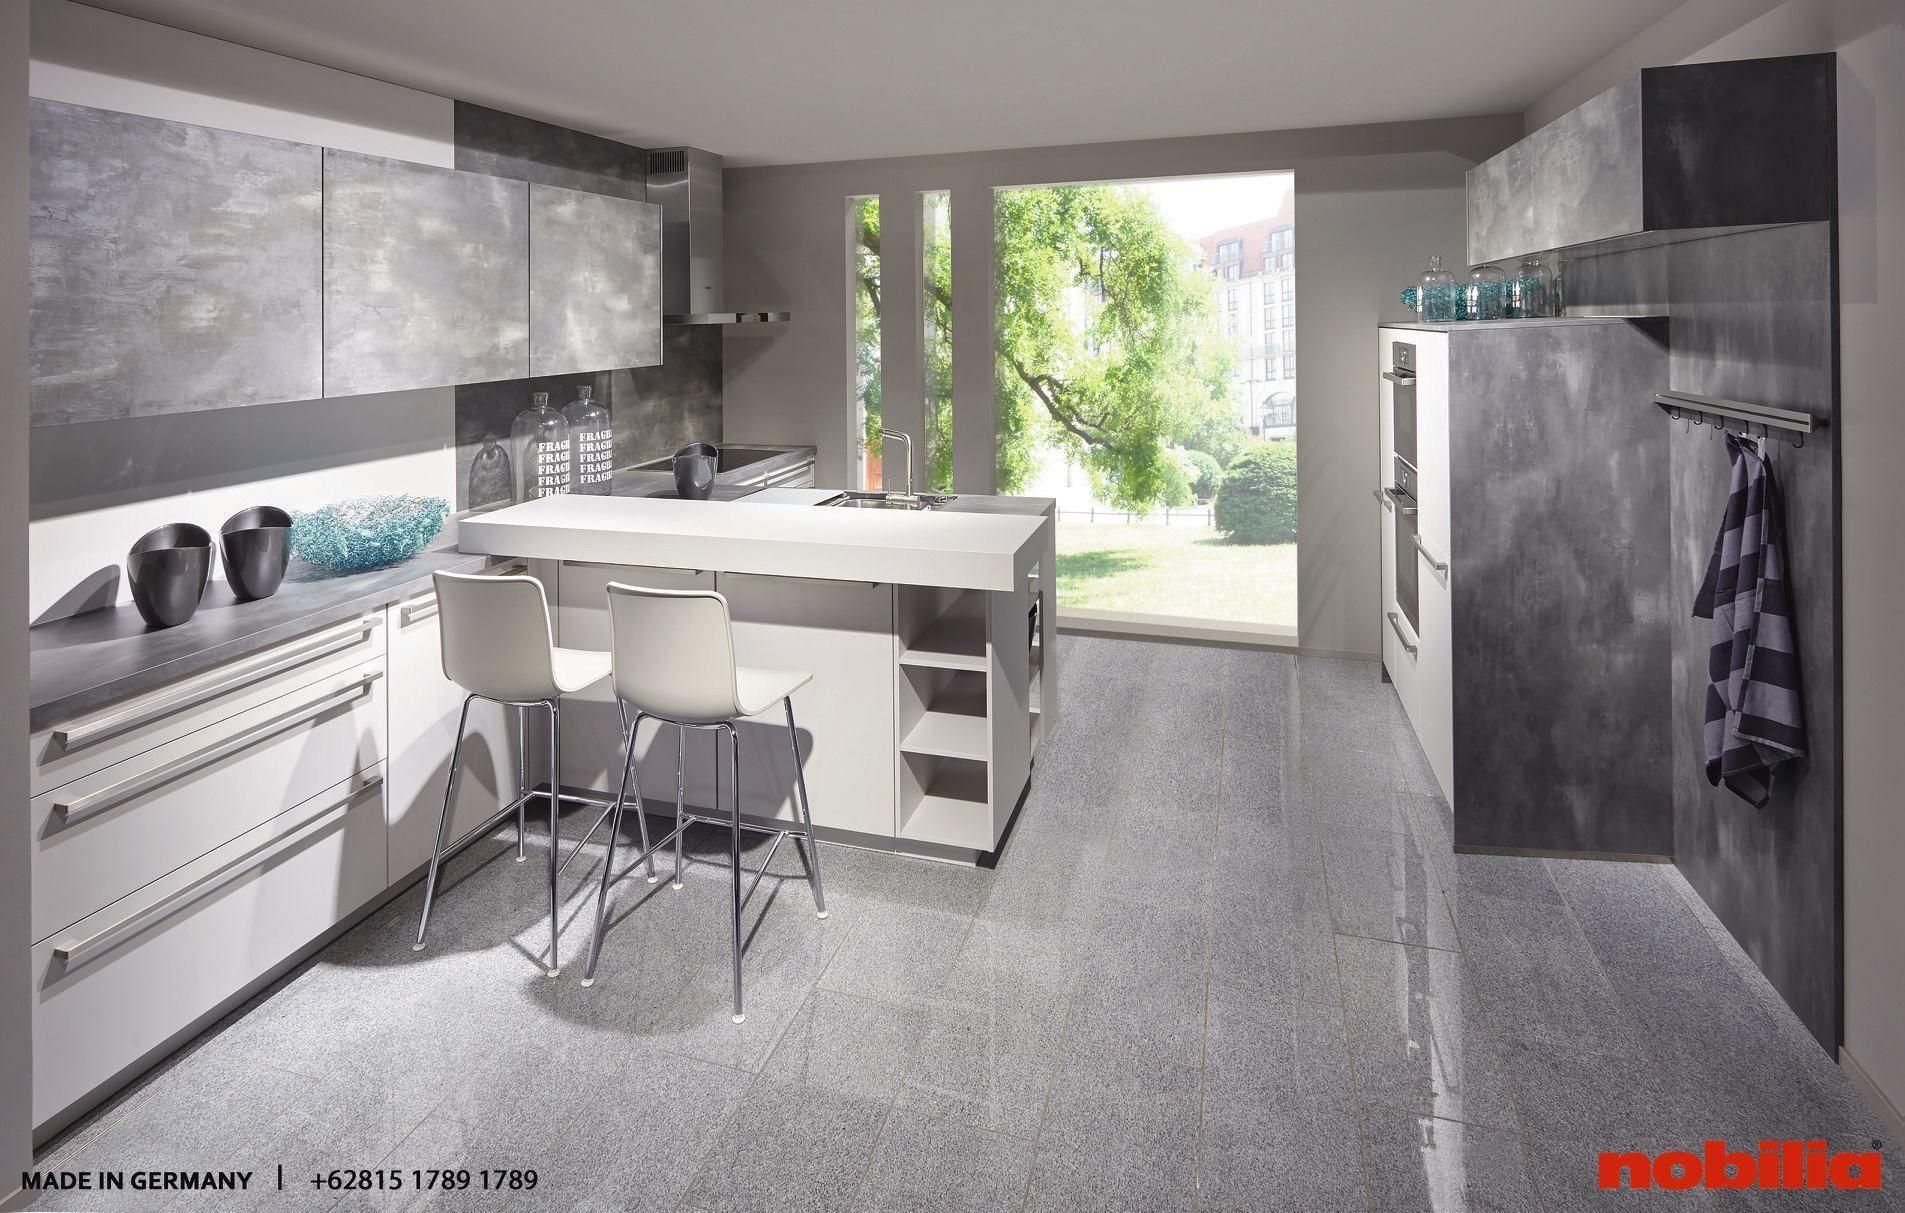 Quality Made in Germany. Kitchen design, German kitchen